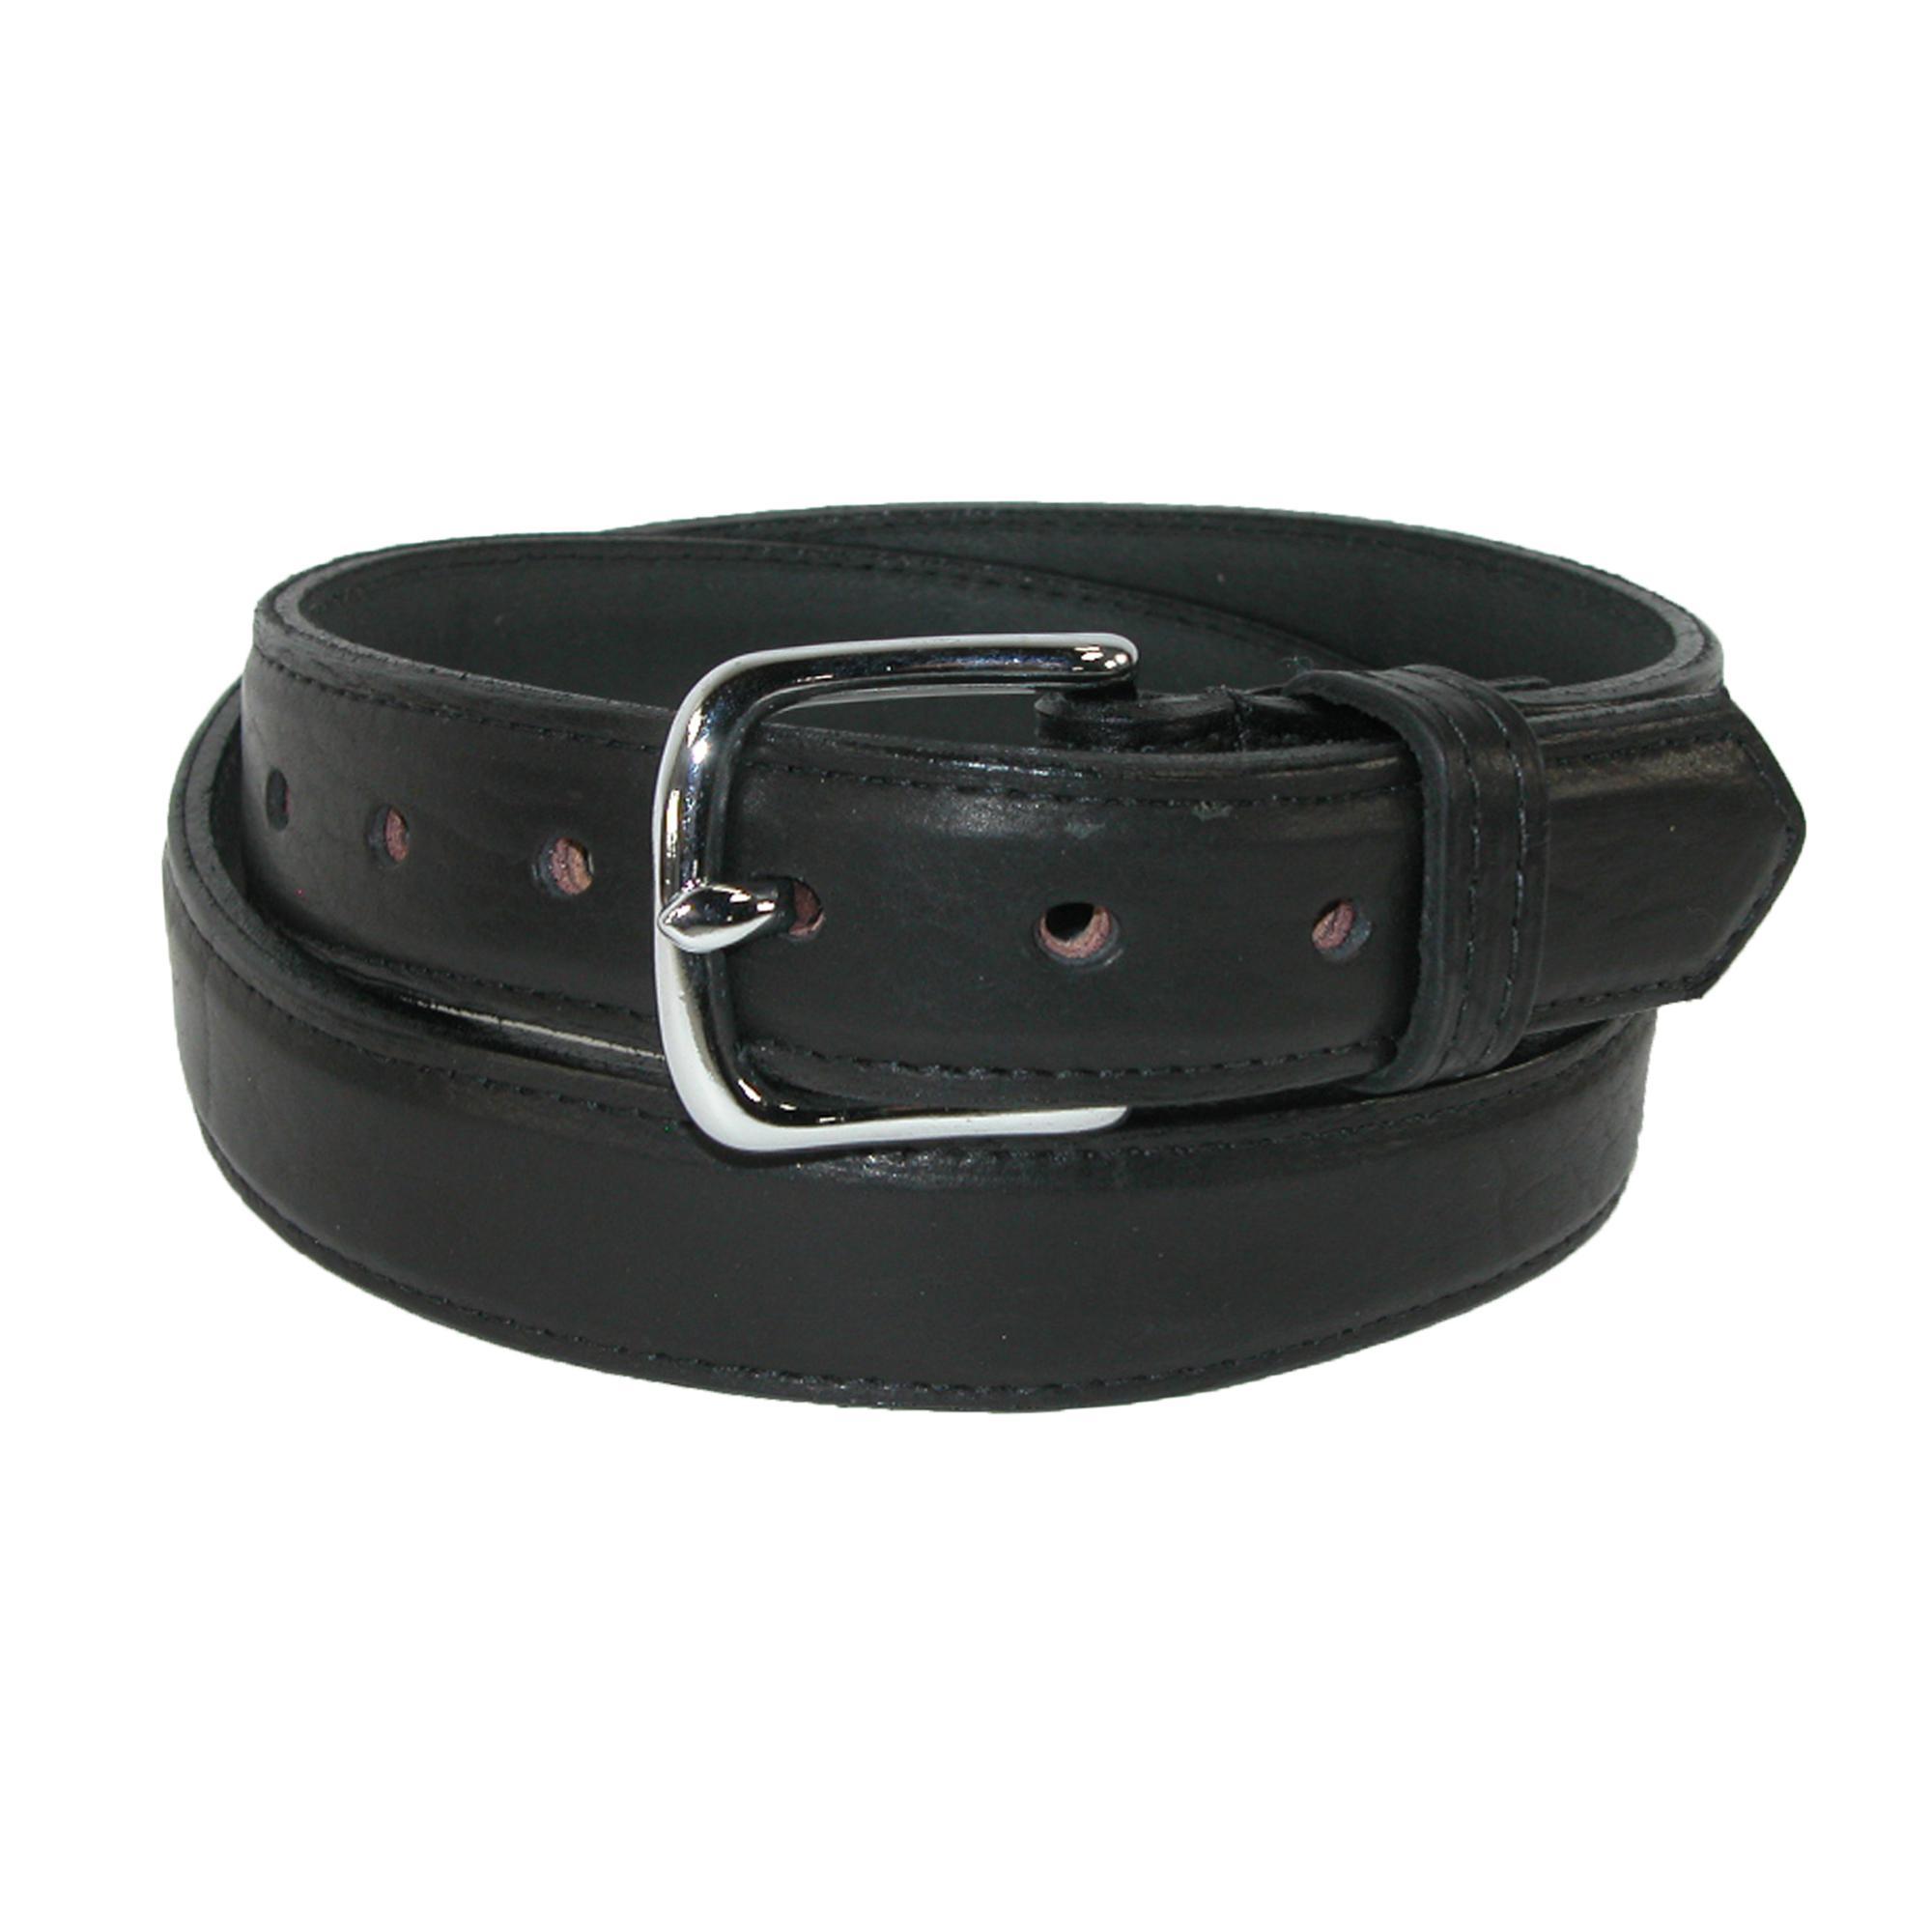 Boston Leather Mens Bison Leather 1.25 Inch Dress Belt